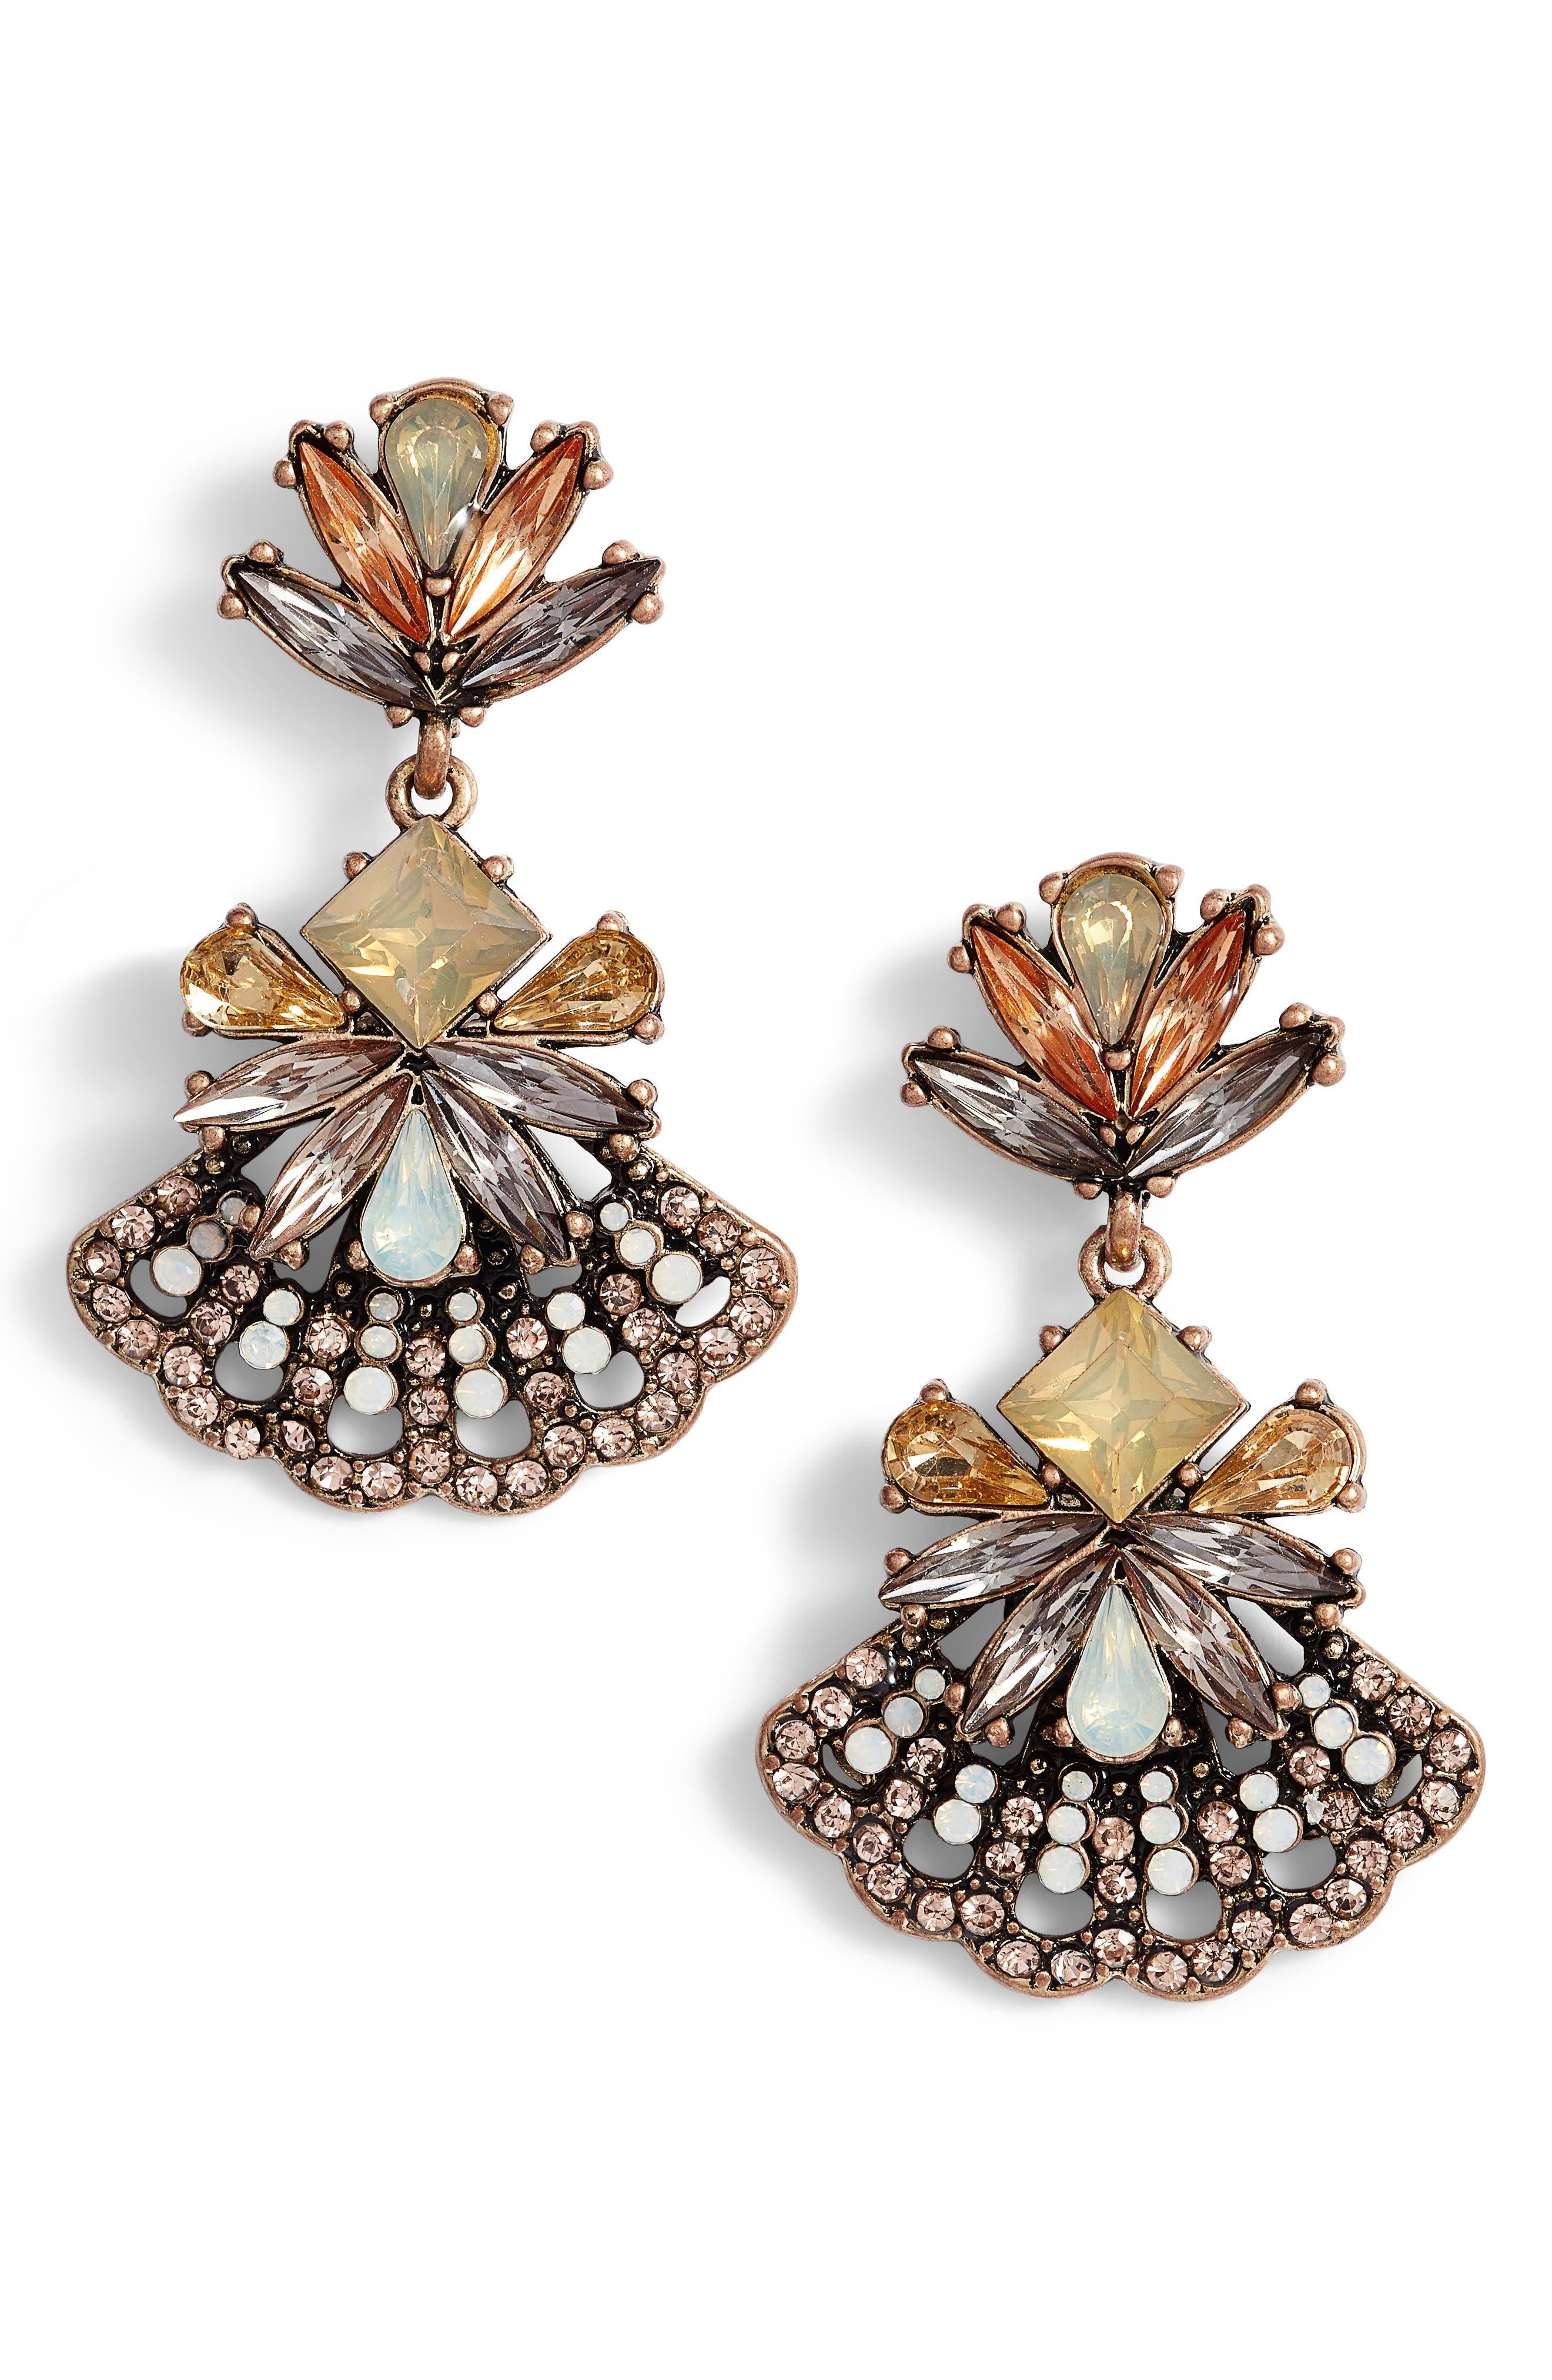 Crystal Fan Earrings,                             Main thumbnail 1, color,                             710